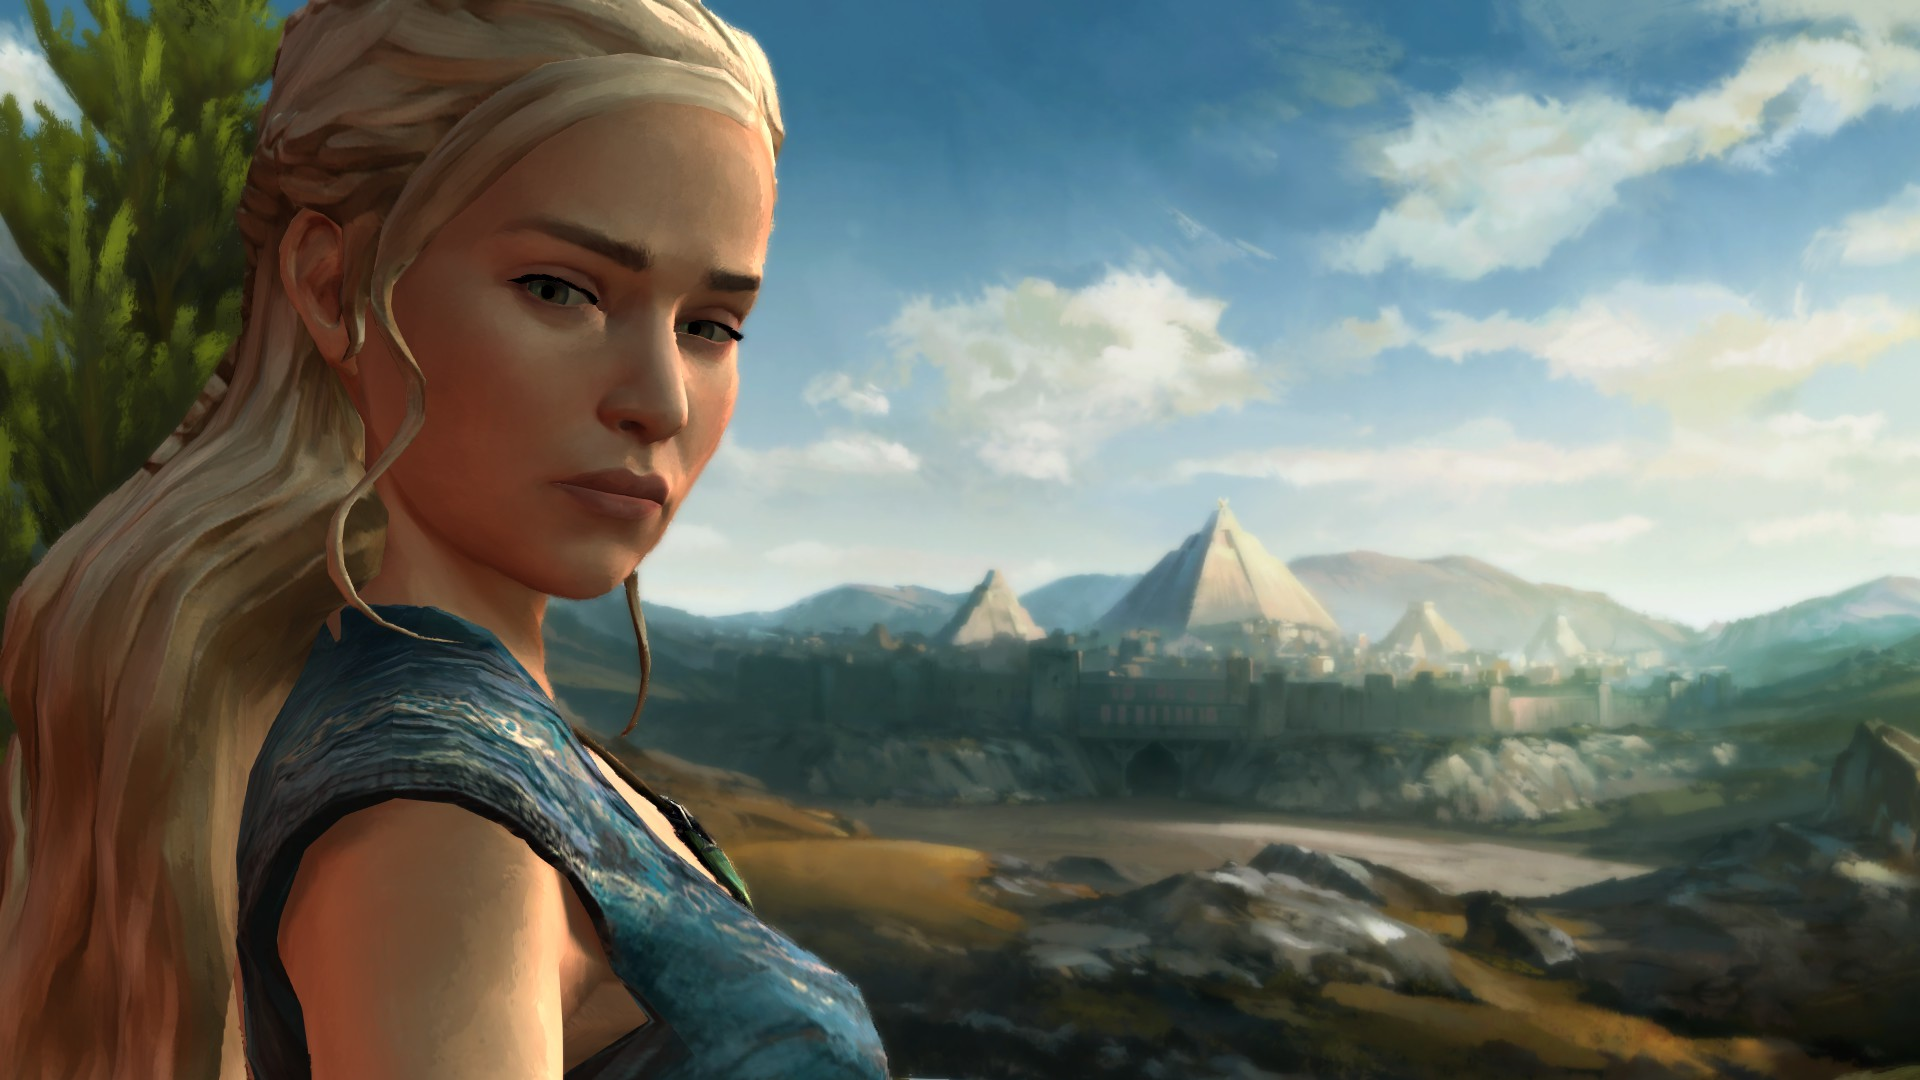 Моё врохождение - Game of Thrones: A Telltale Games Series